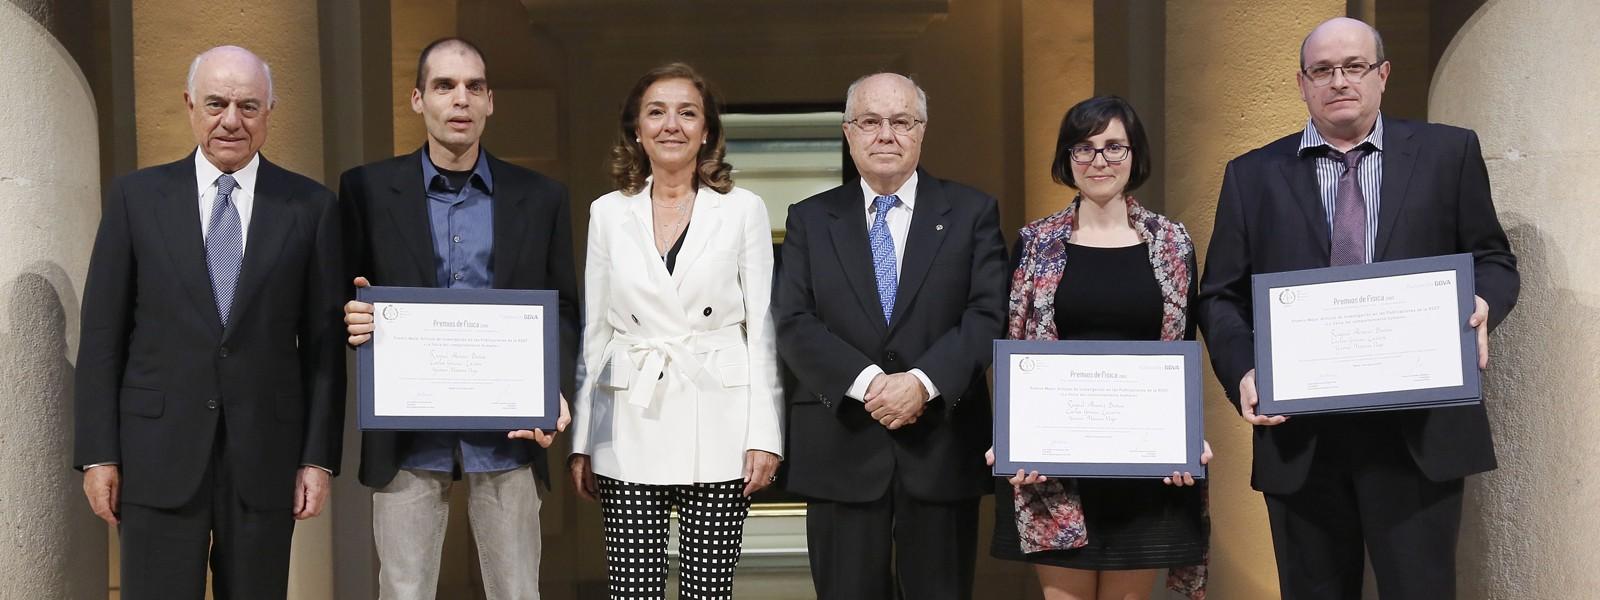 Premios_Fisica_2015_Alvarez_Gracia-Lazaro_Moreno_314x387